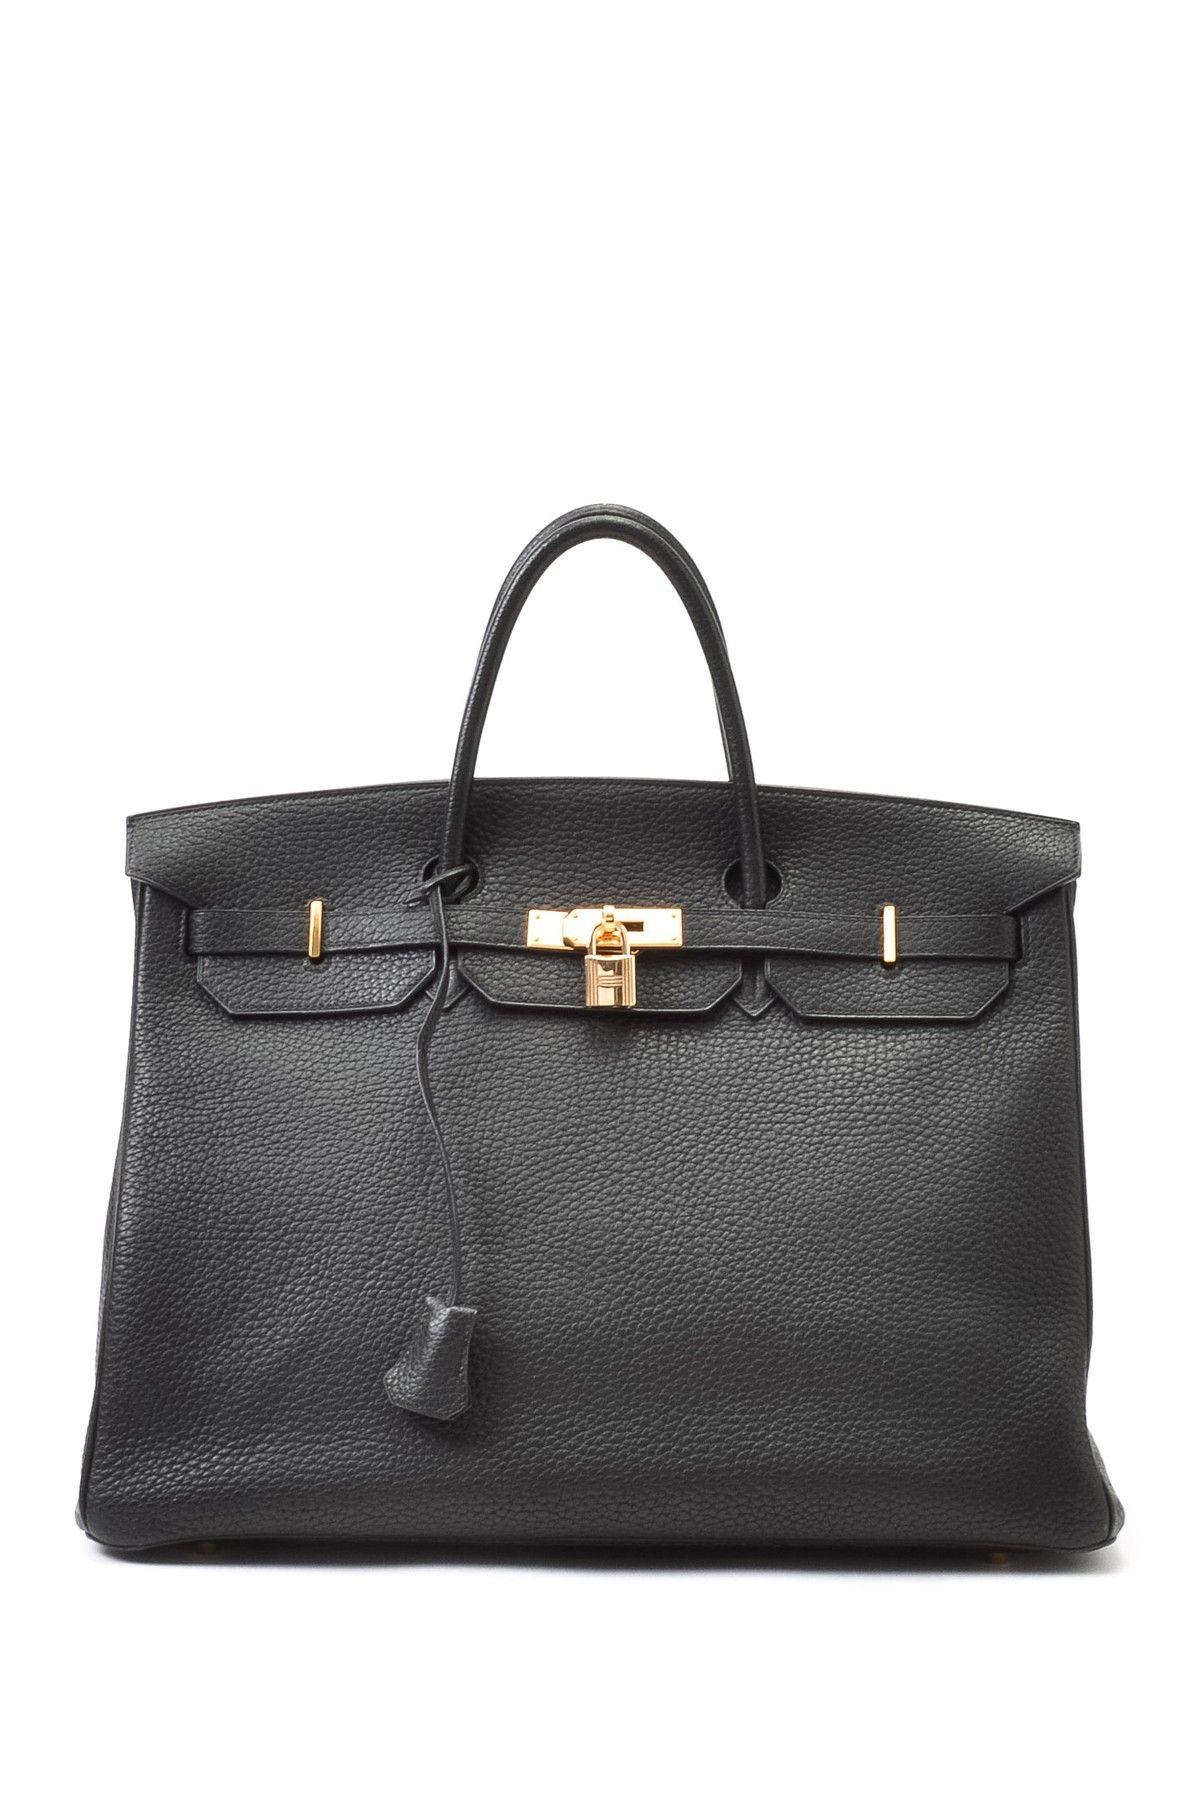 3e990c43269d Vintage Hermes Leather Birkin 40 Handbag on HauteLook